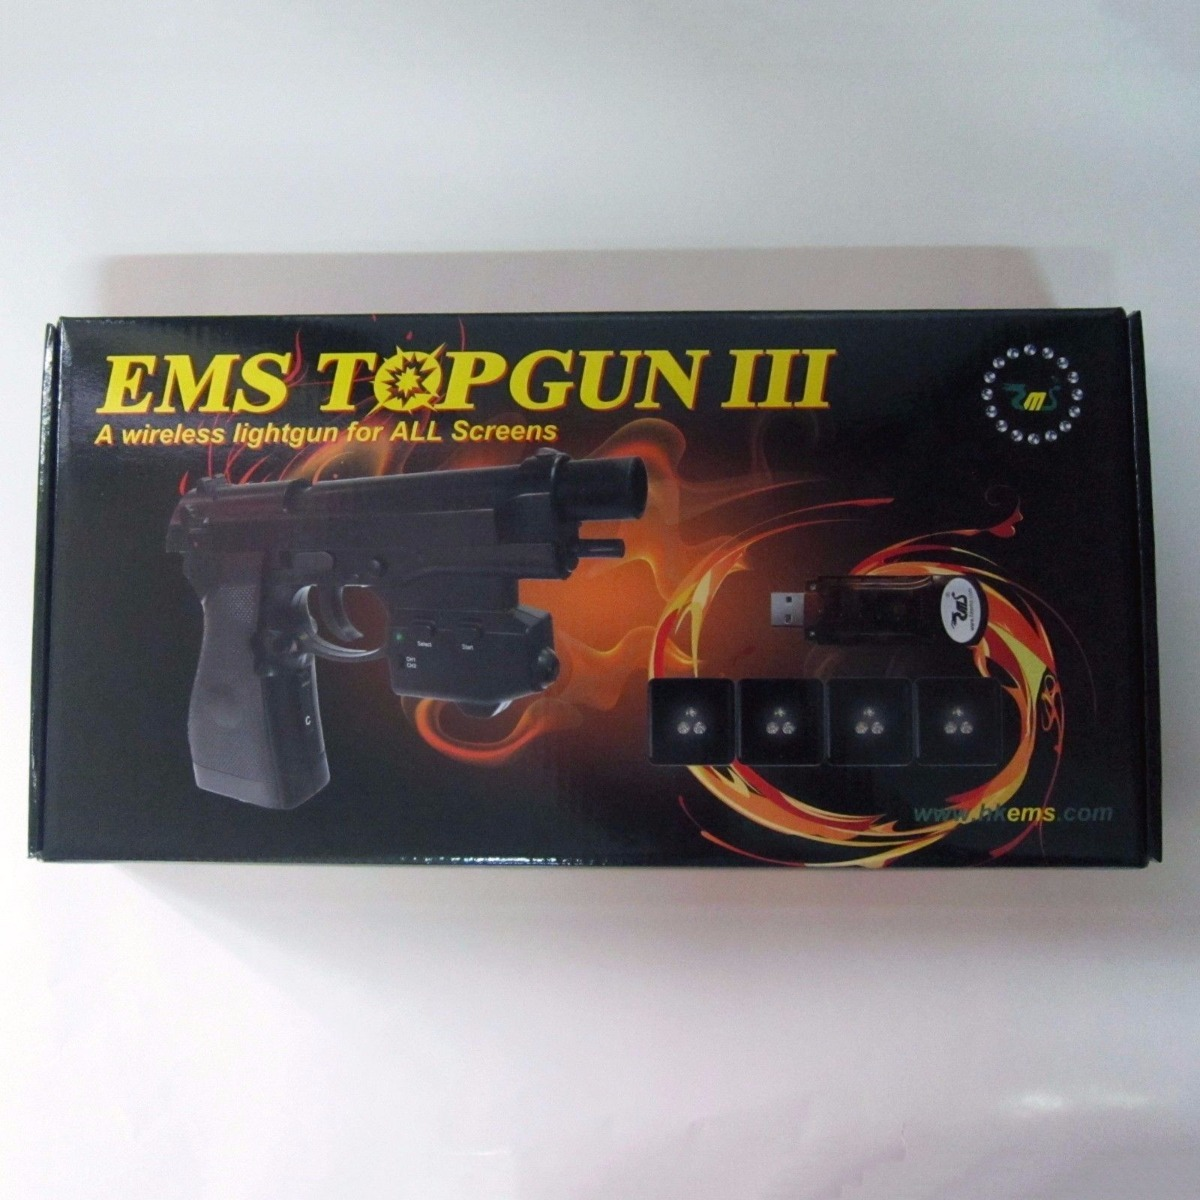 EMS TOPGUN 3 DRIVERS FOR WINDOWS 7